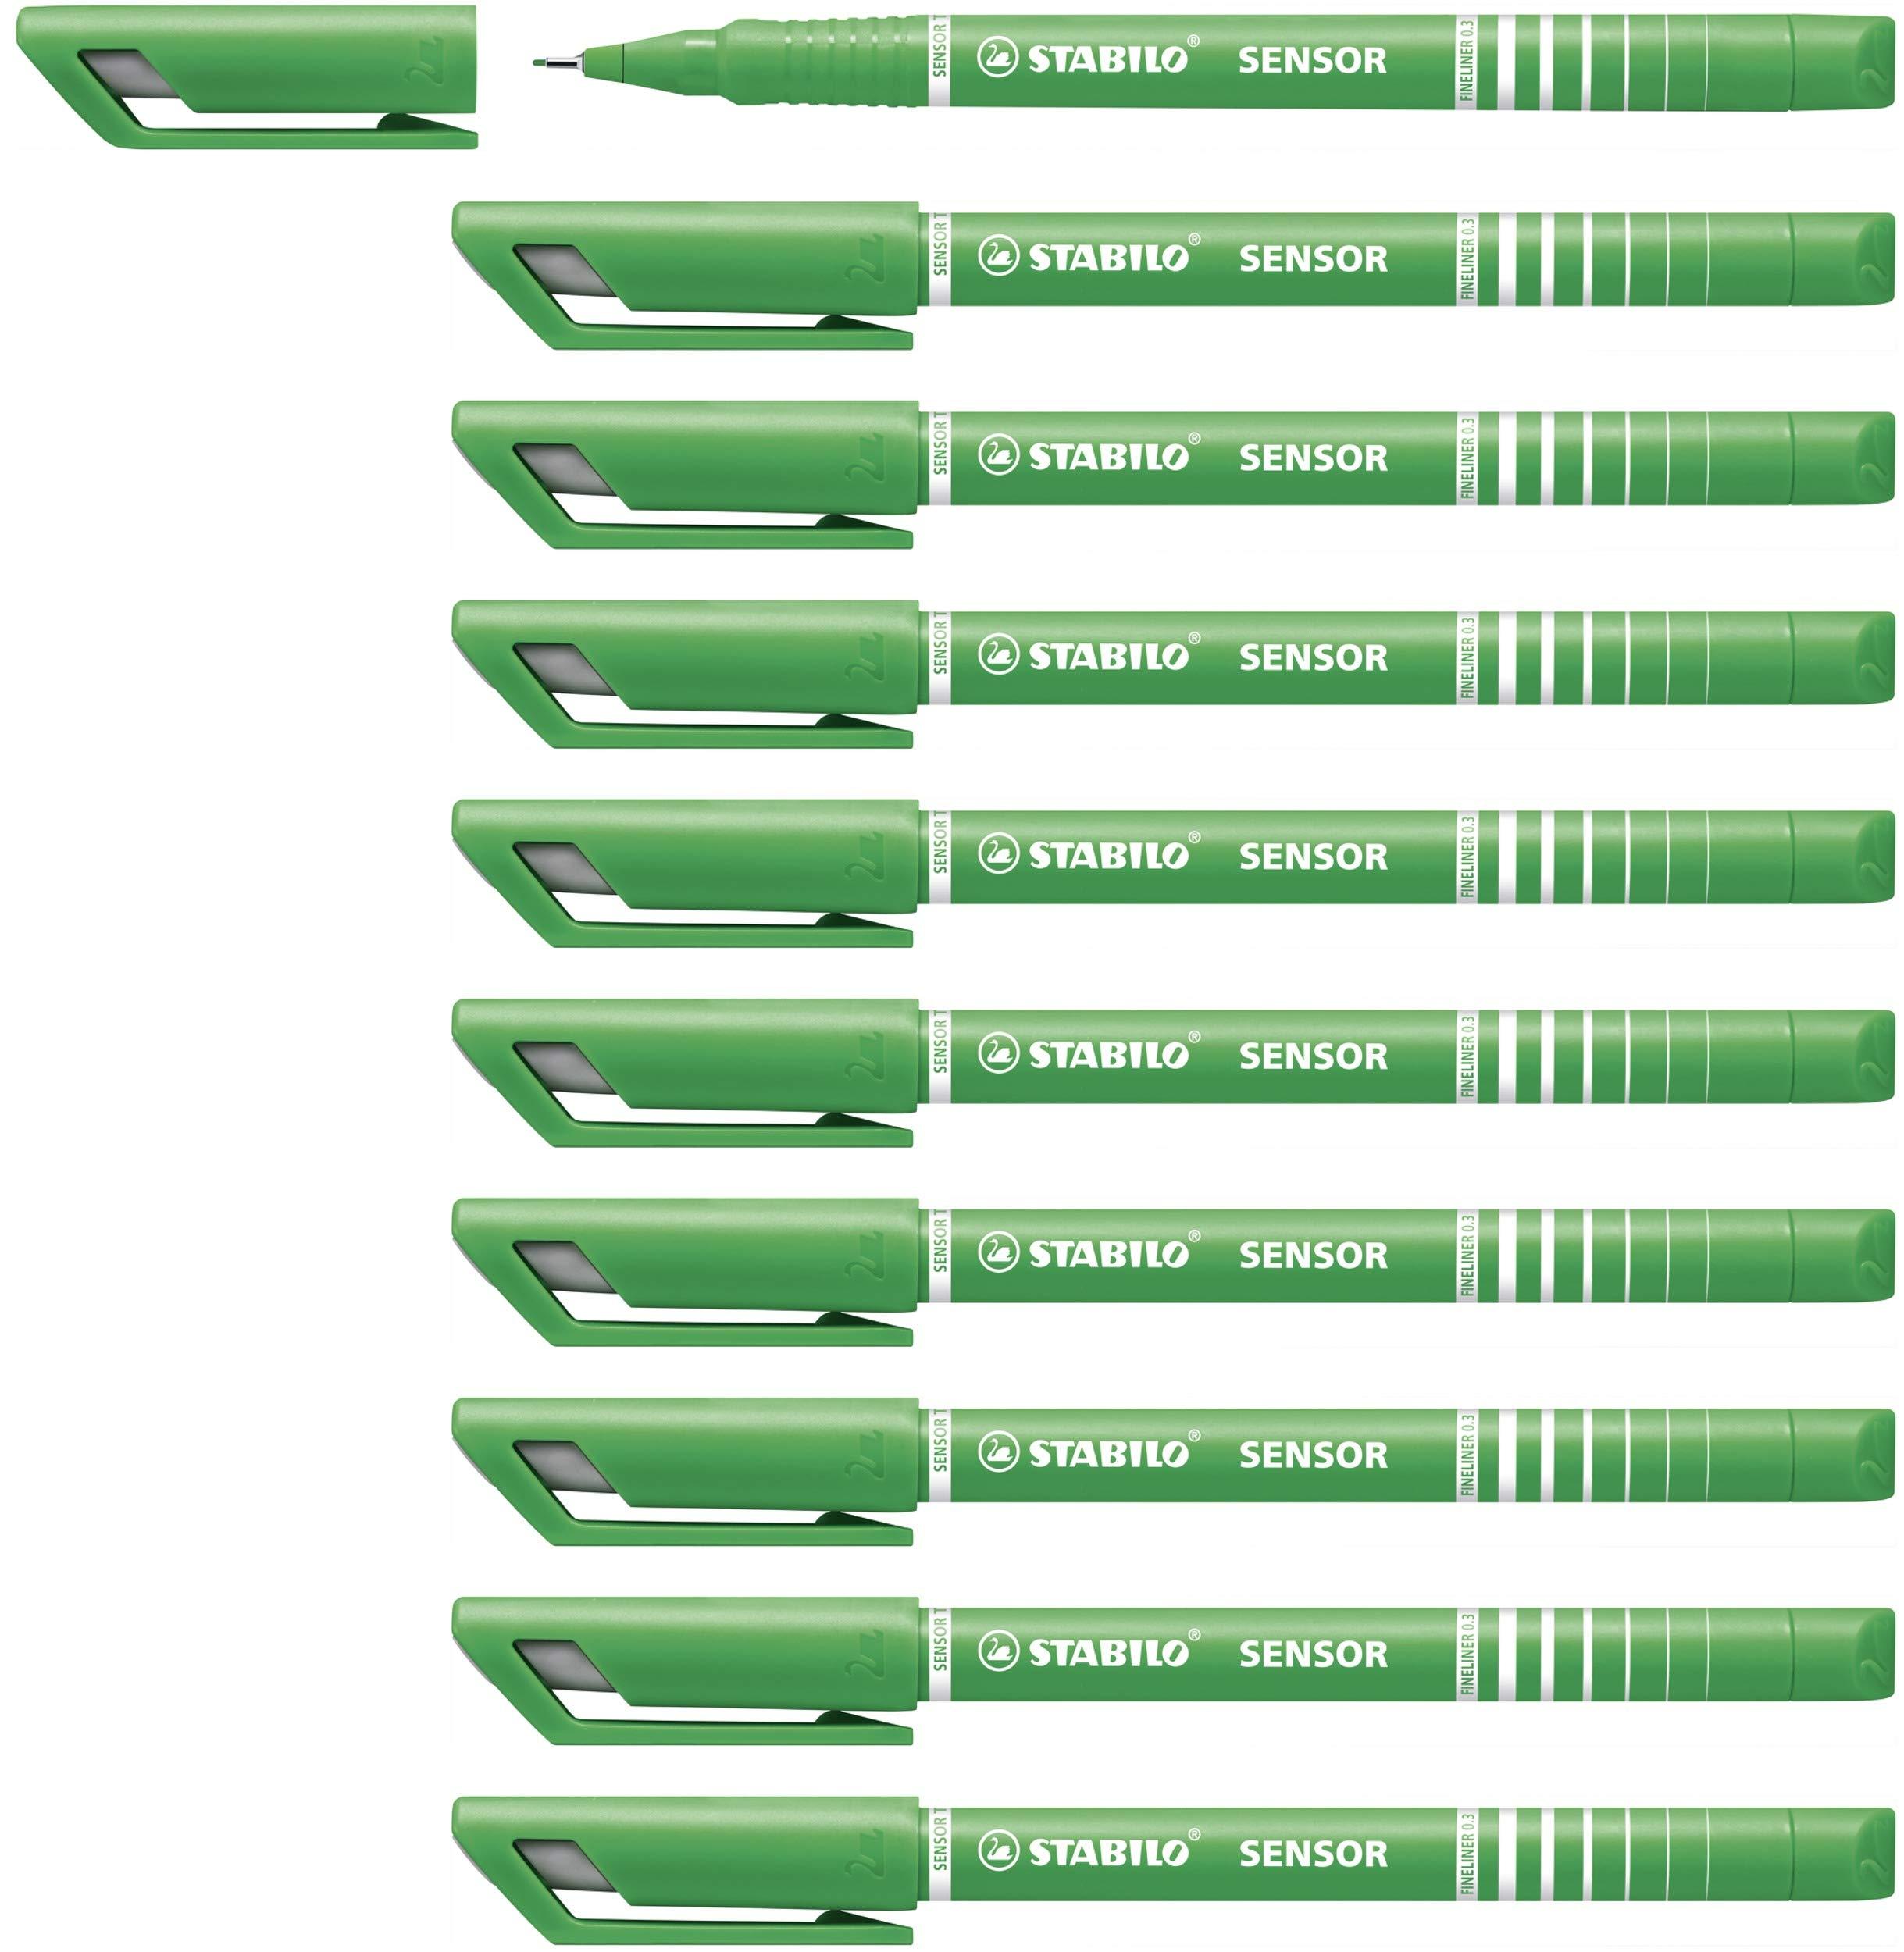 Fineliner - STABILO Sensor F Box of 10 Green